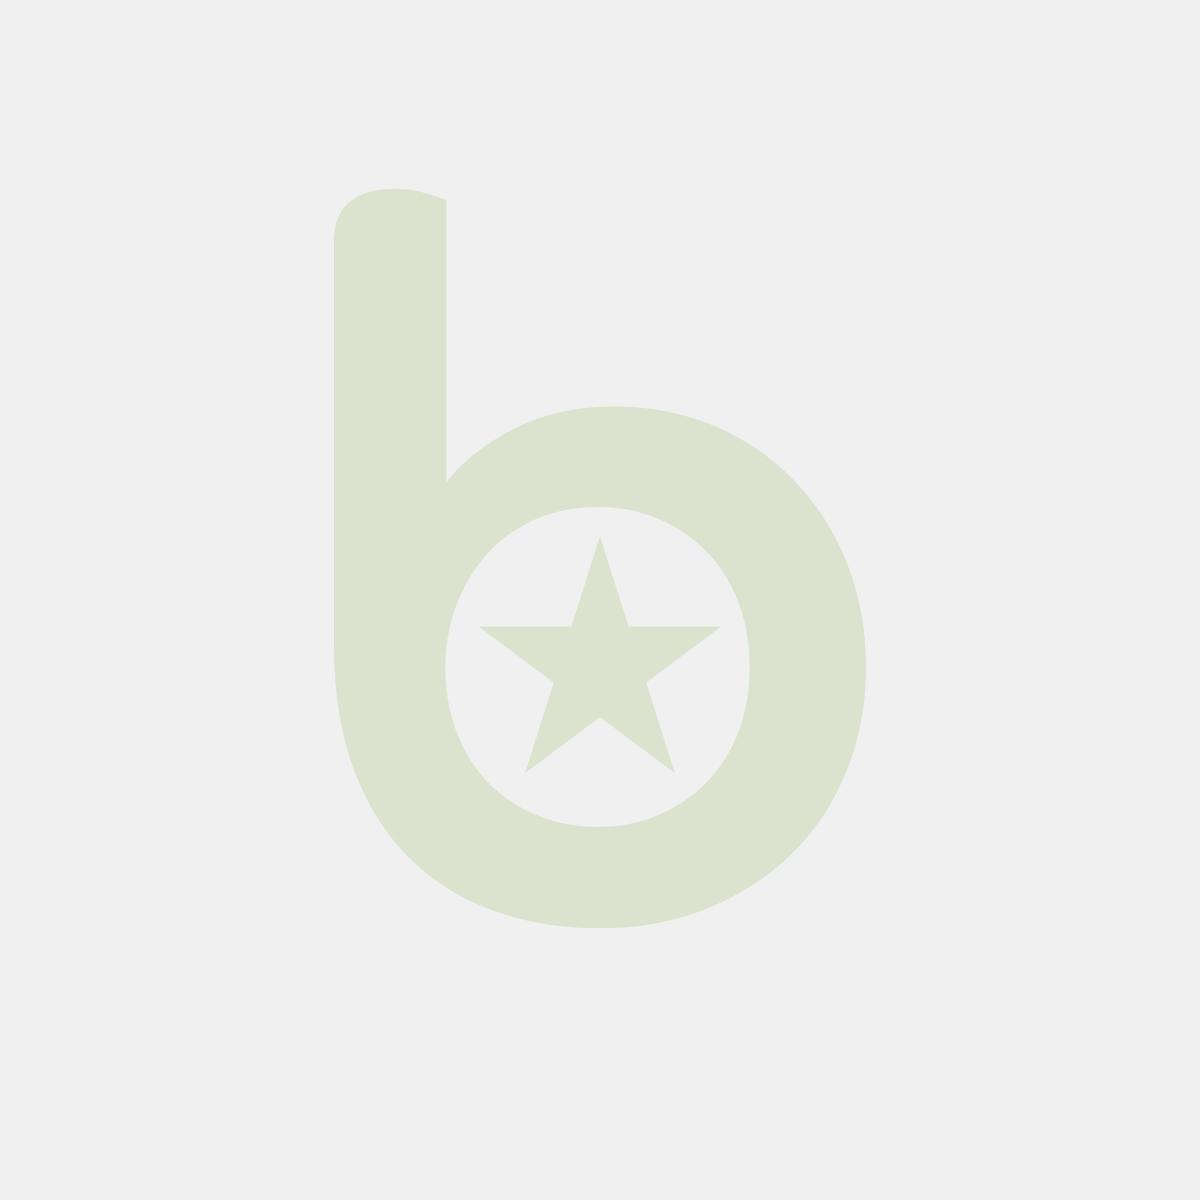 FINGERFOOD - pucharek PS kwadratowy 55ml transparentny 4,2x4,2x4,7 op. 96 sztuk